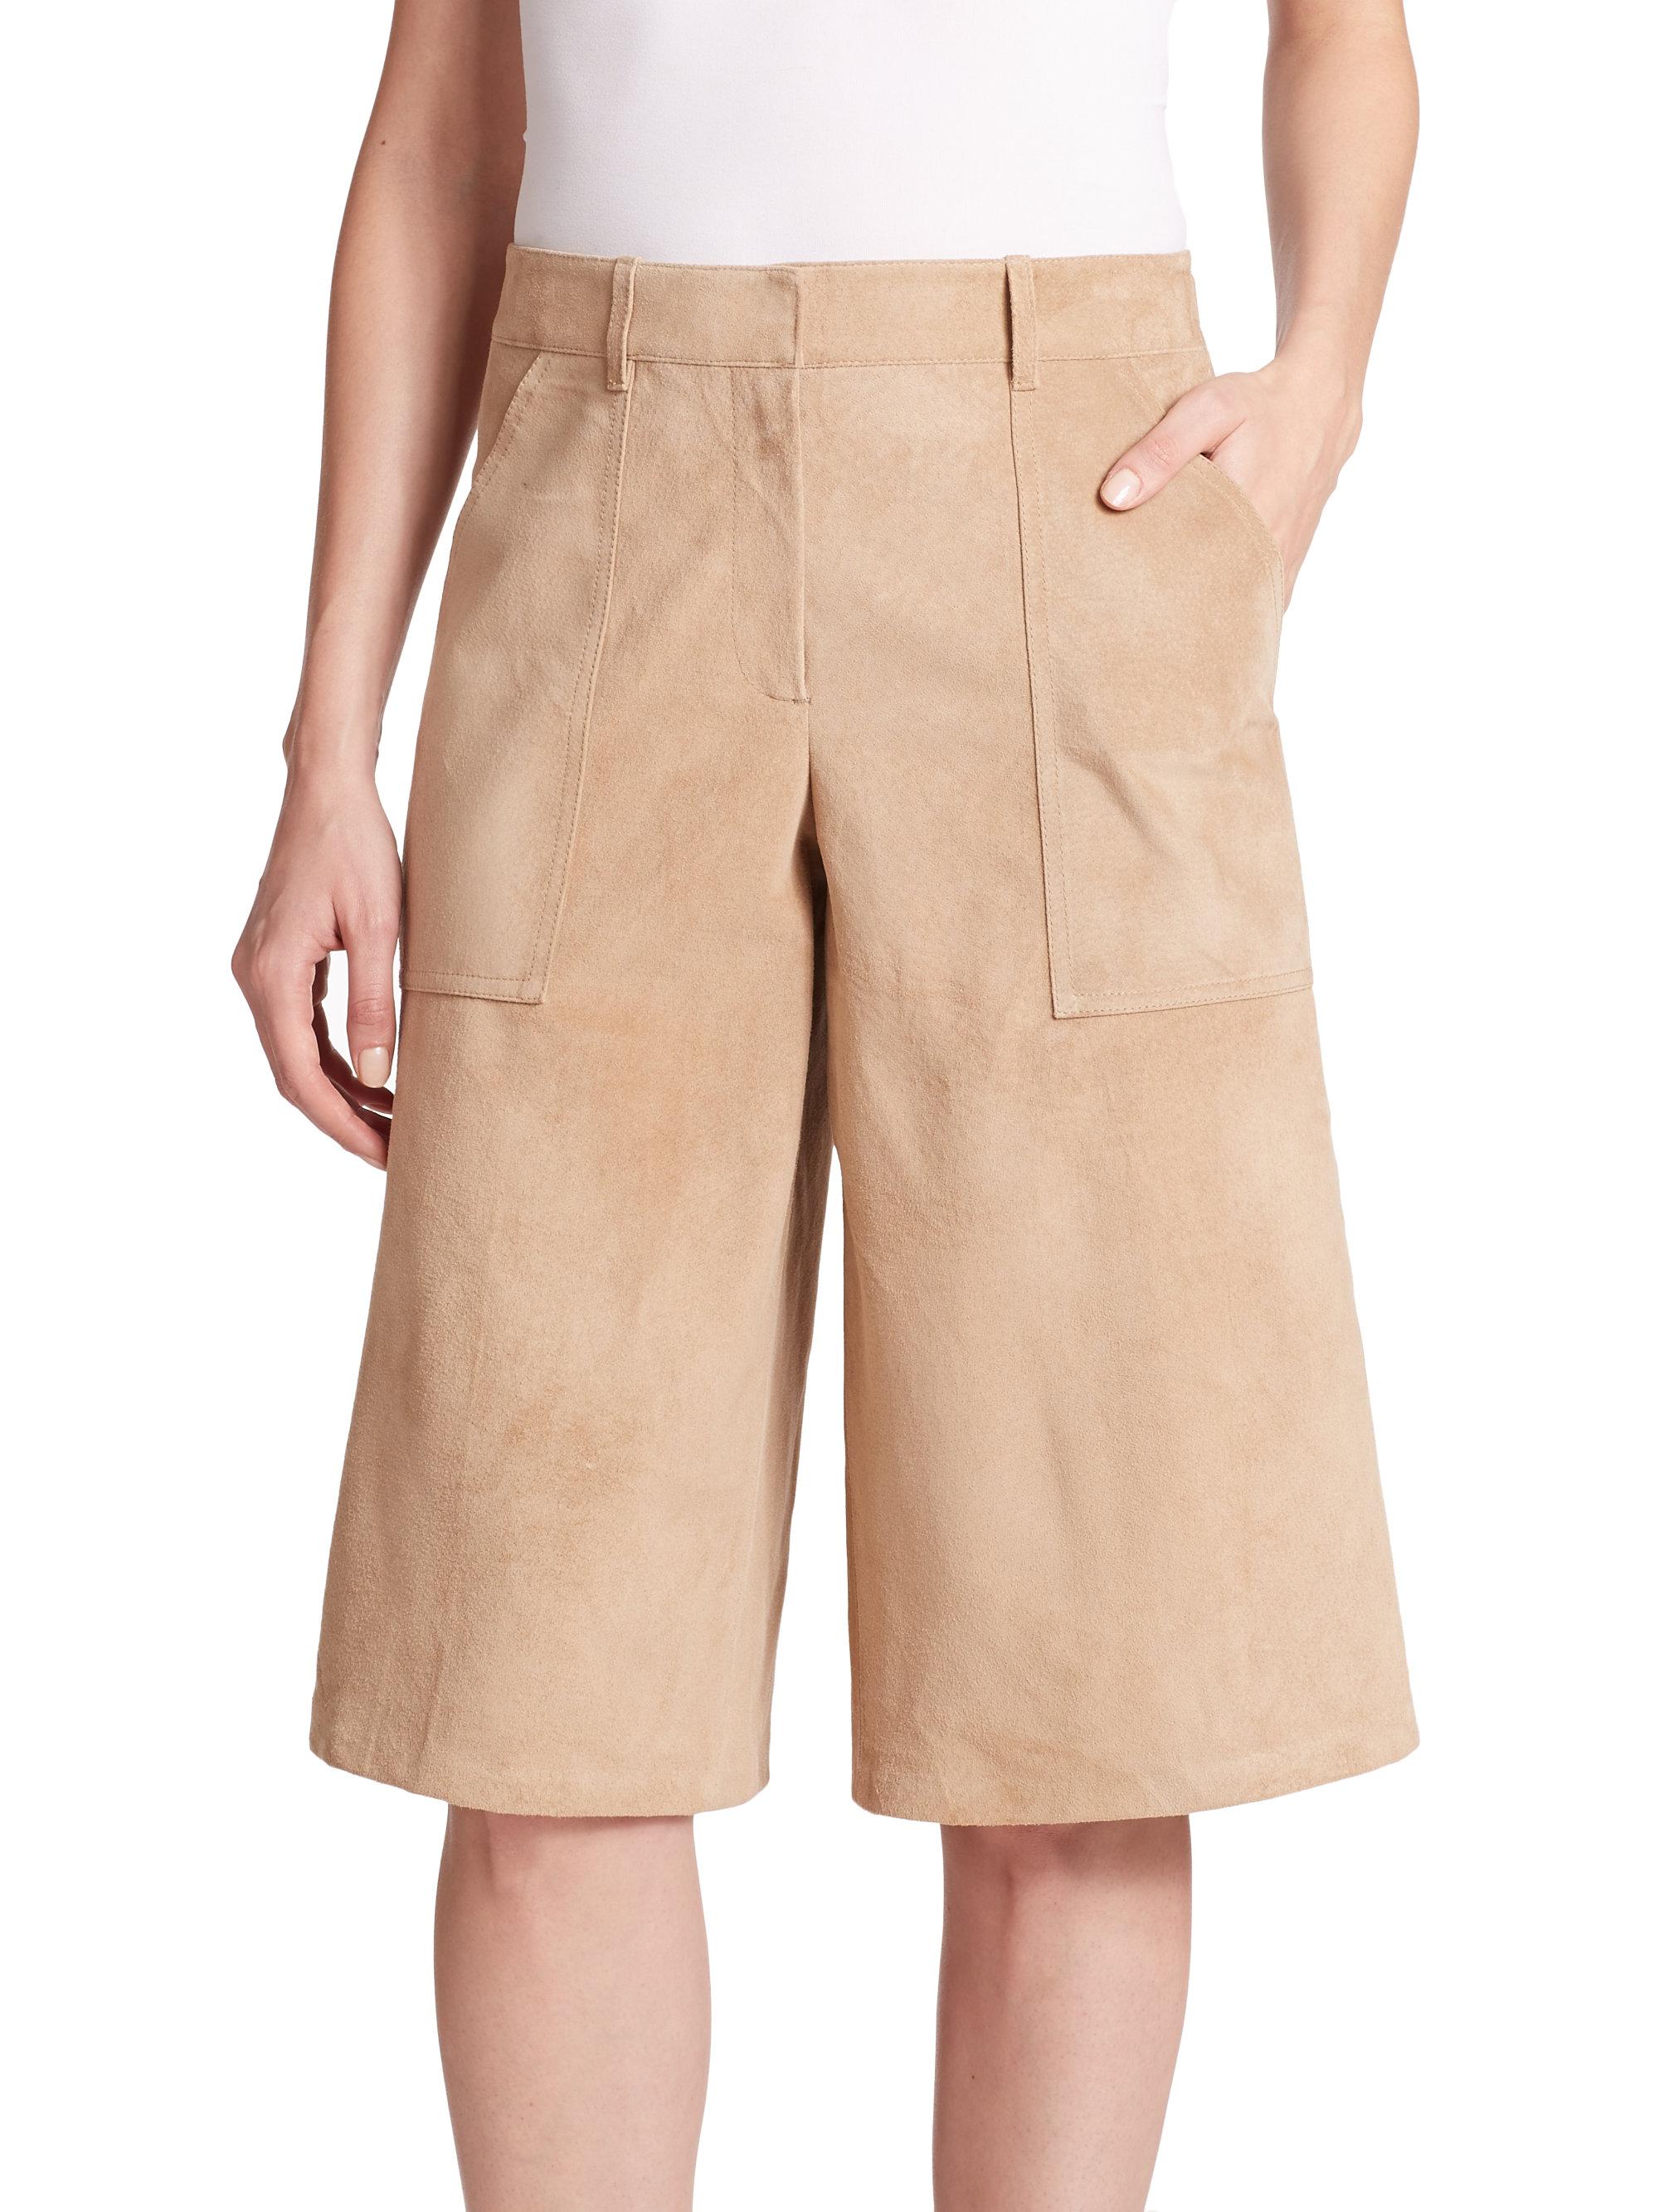 Bermuda pants - definition of Bermuda pants by The Free ...